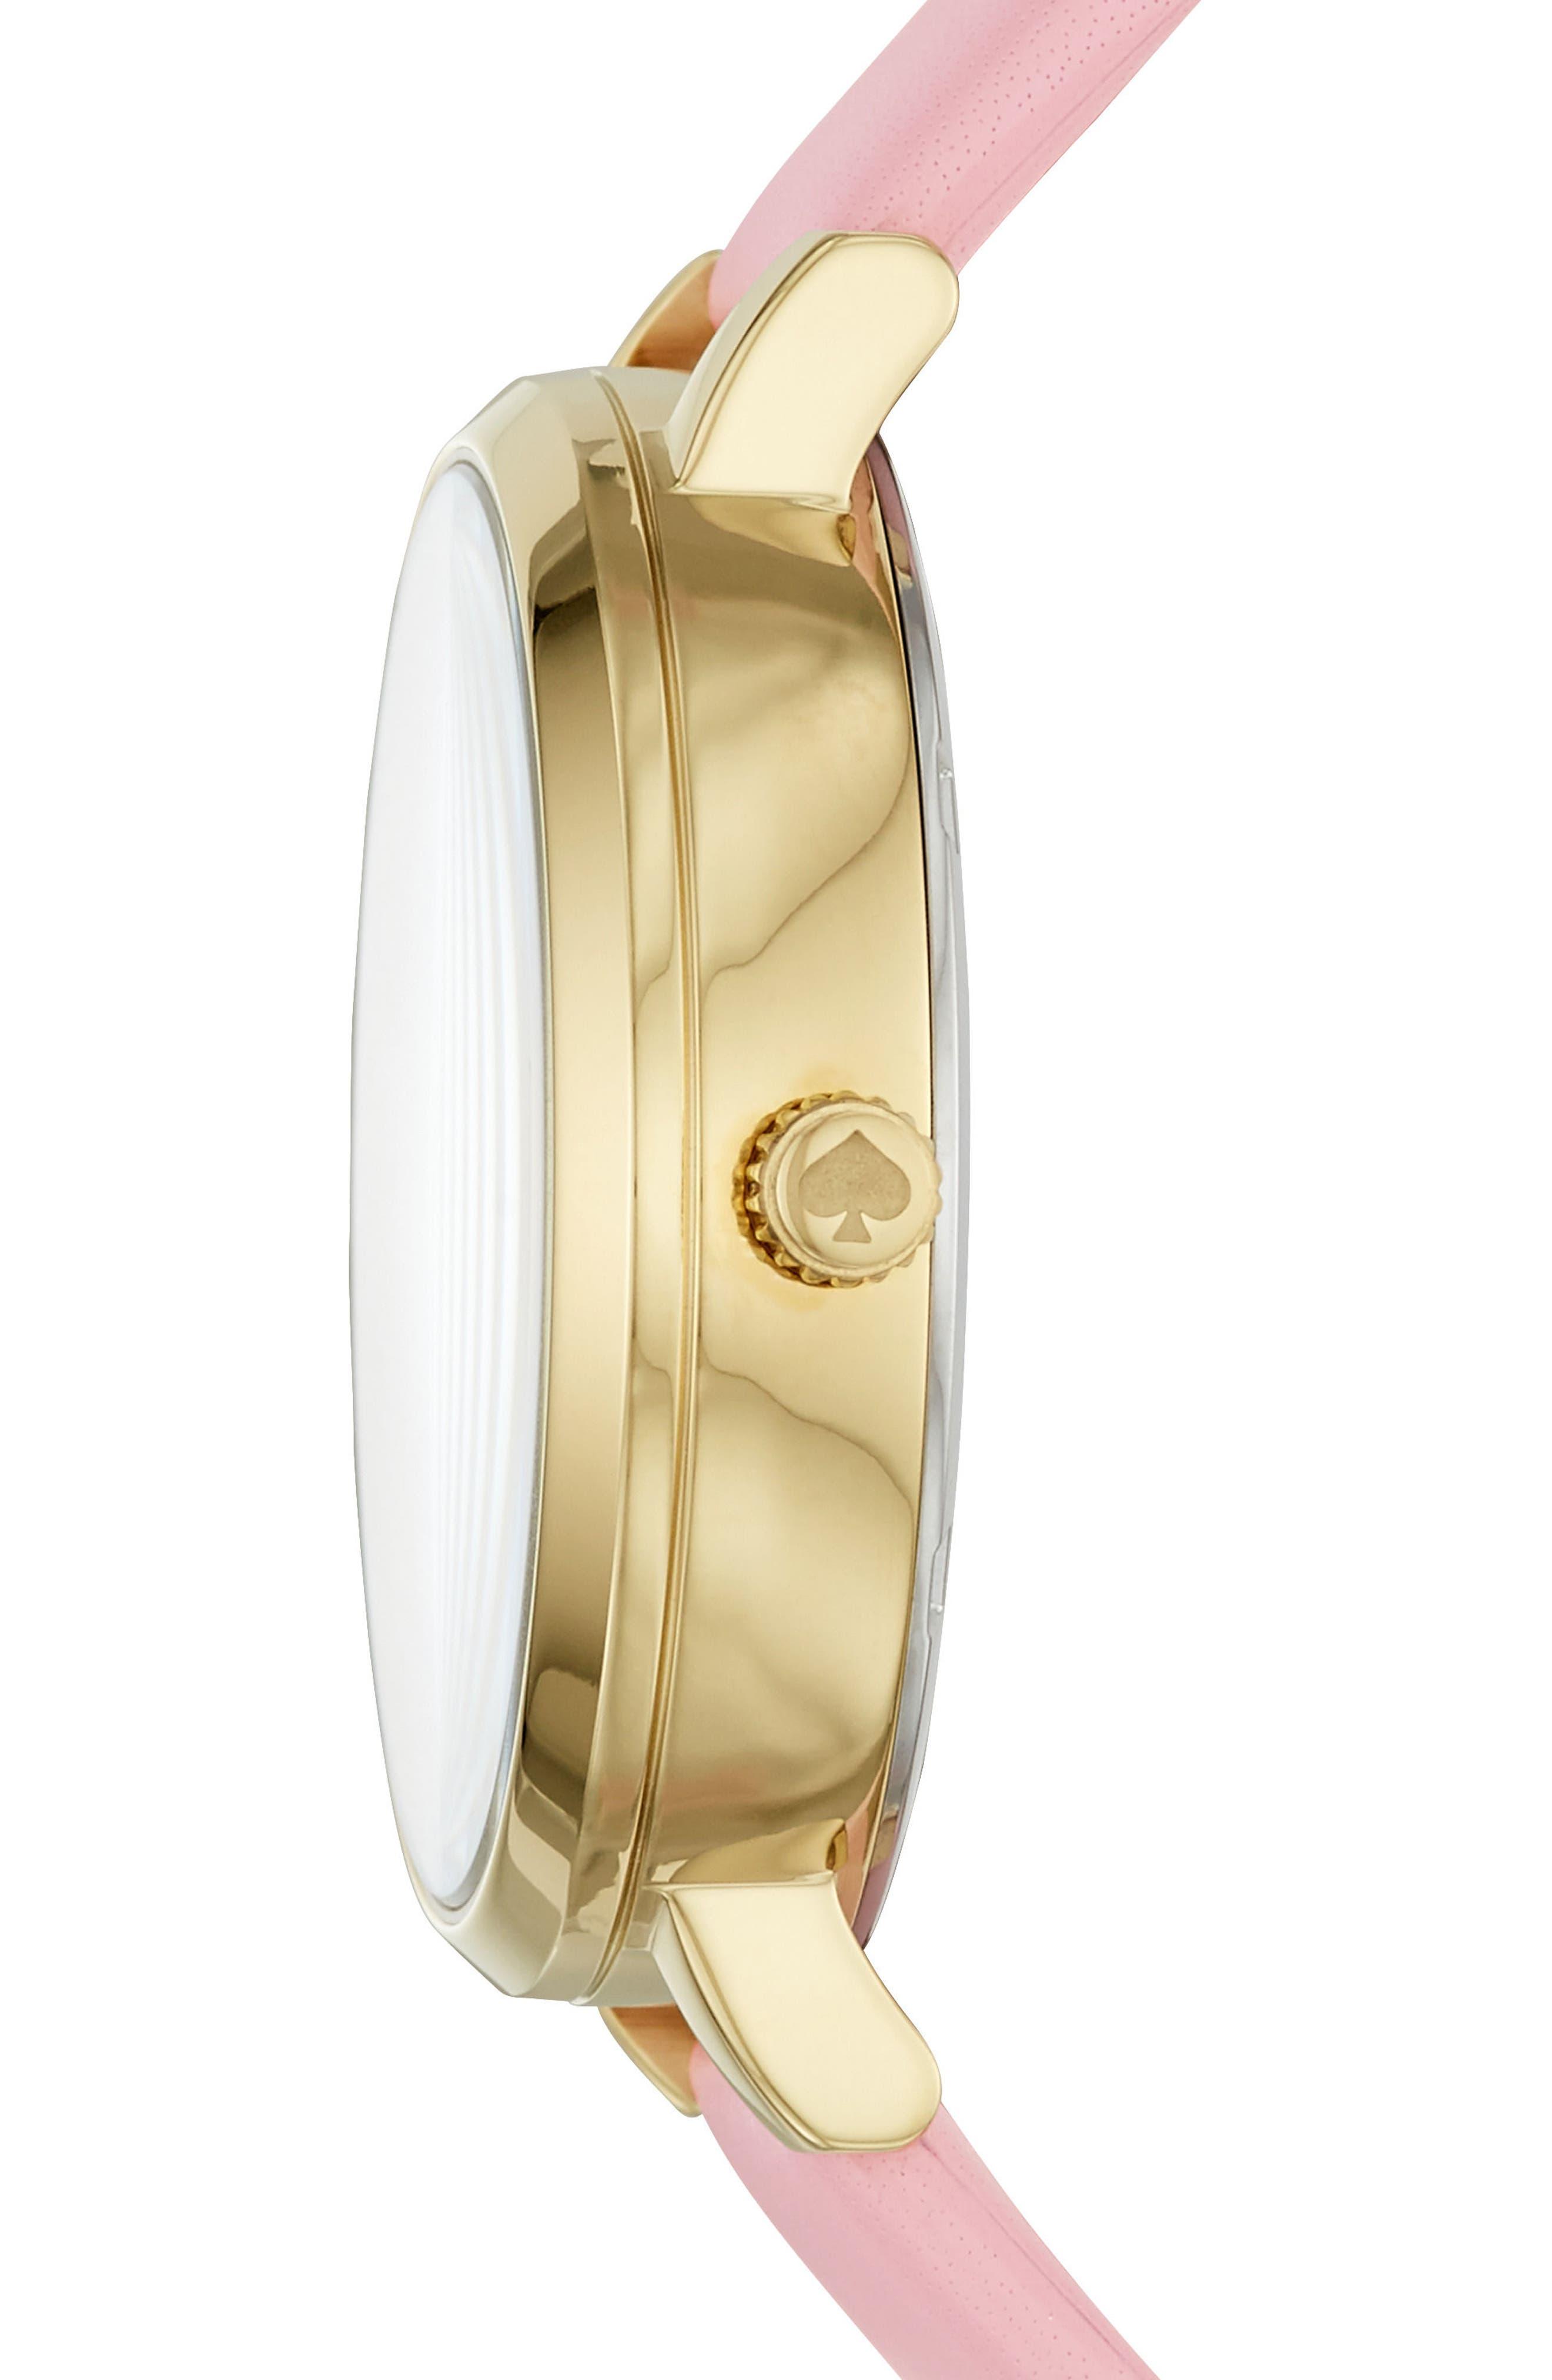 monterey alligator leather strap watch, 38mm,                             Alternate thumbnail 2, color,                             Pink/ Beige/ Gold